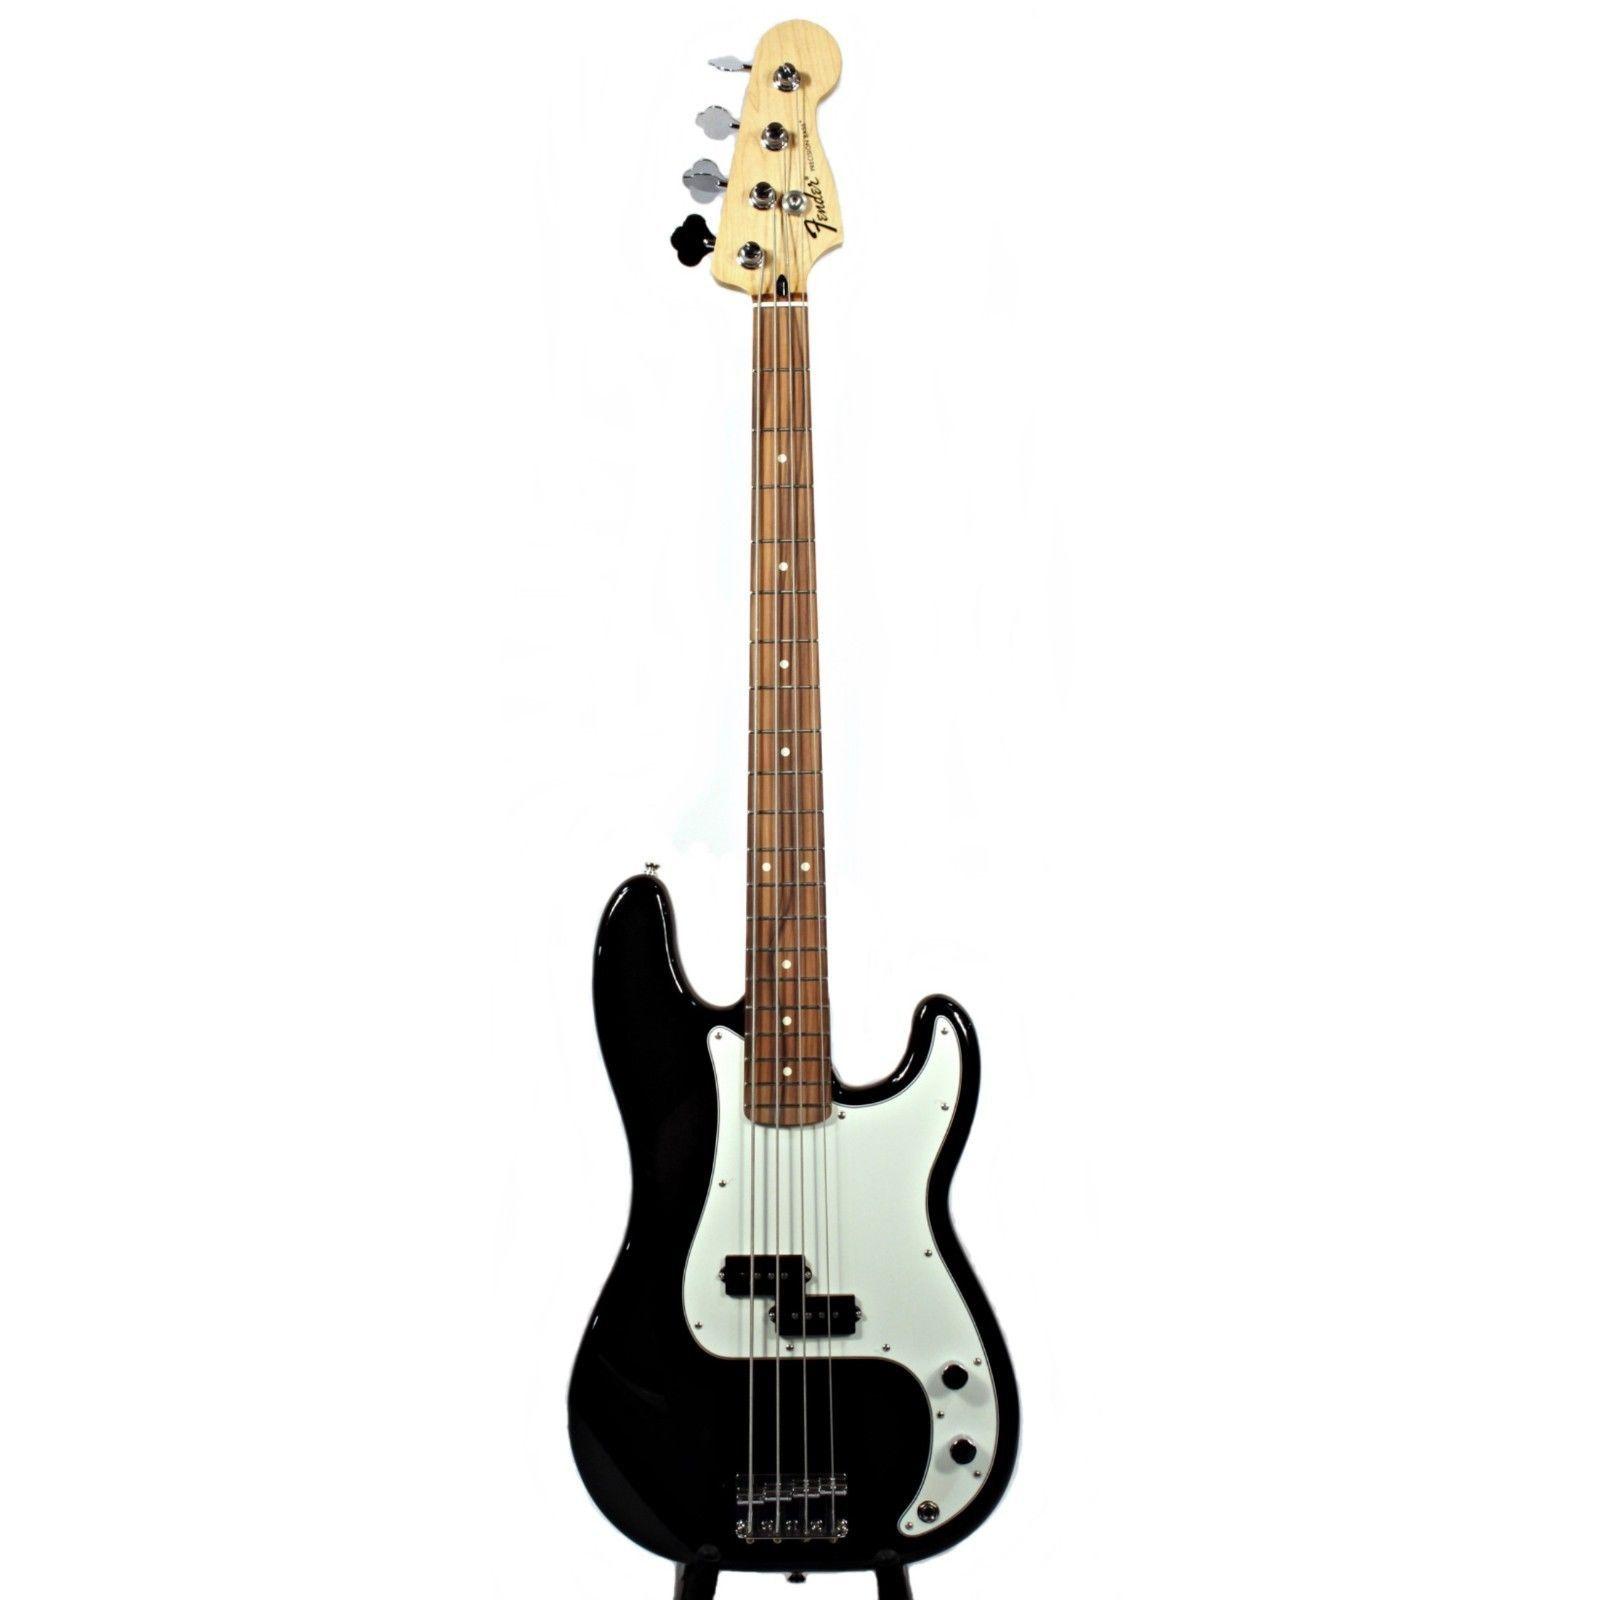 Fender Standard Precision Bass Guitar Model 0146103506 Price 599 95 Guitars For Sale Cheap Acoustic Guitars For Shop Insurance Guitar Bass Guitar